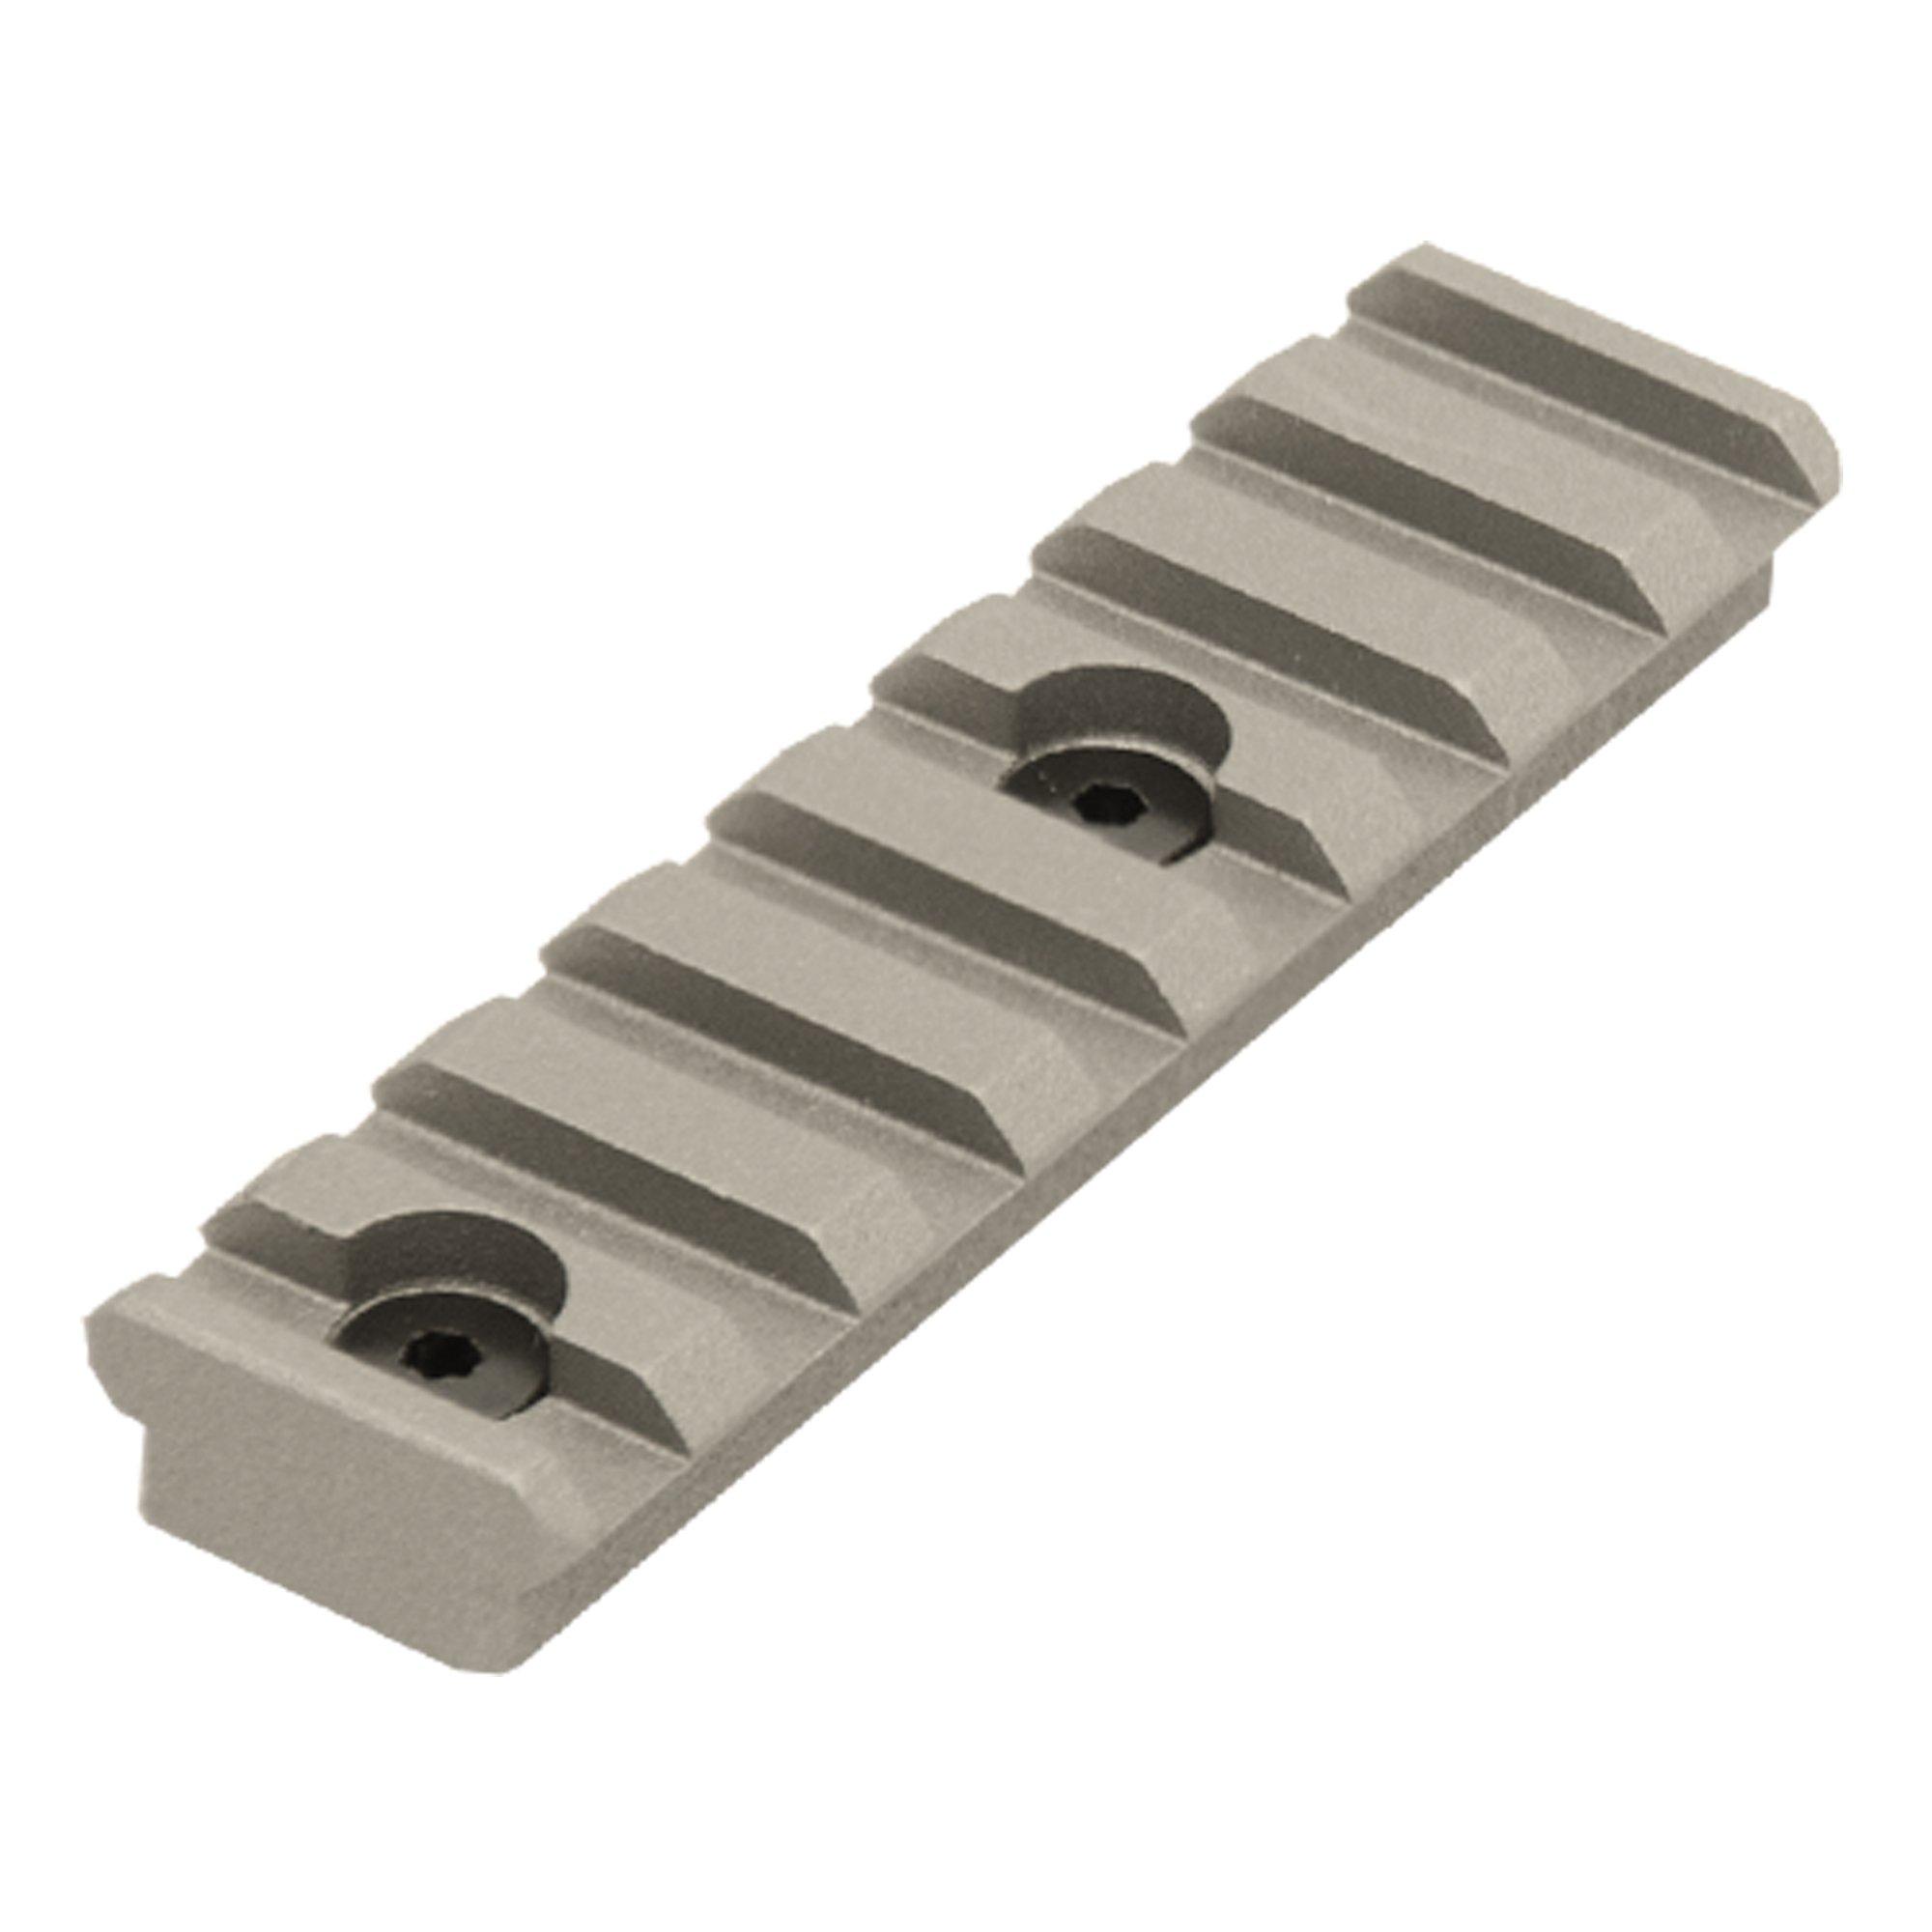 UTG PRO 8-Slot Keymod Picatinny Rail Section-Gun Metal Grey